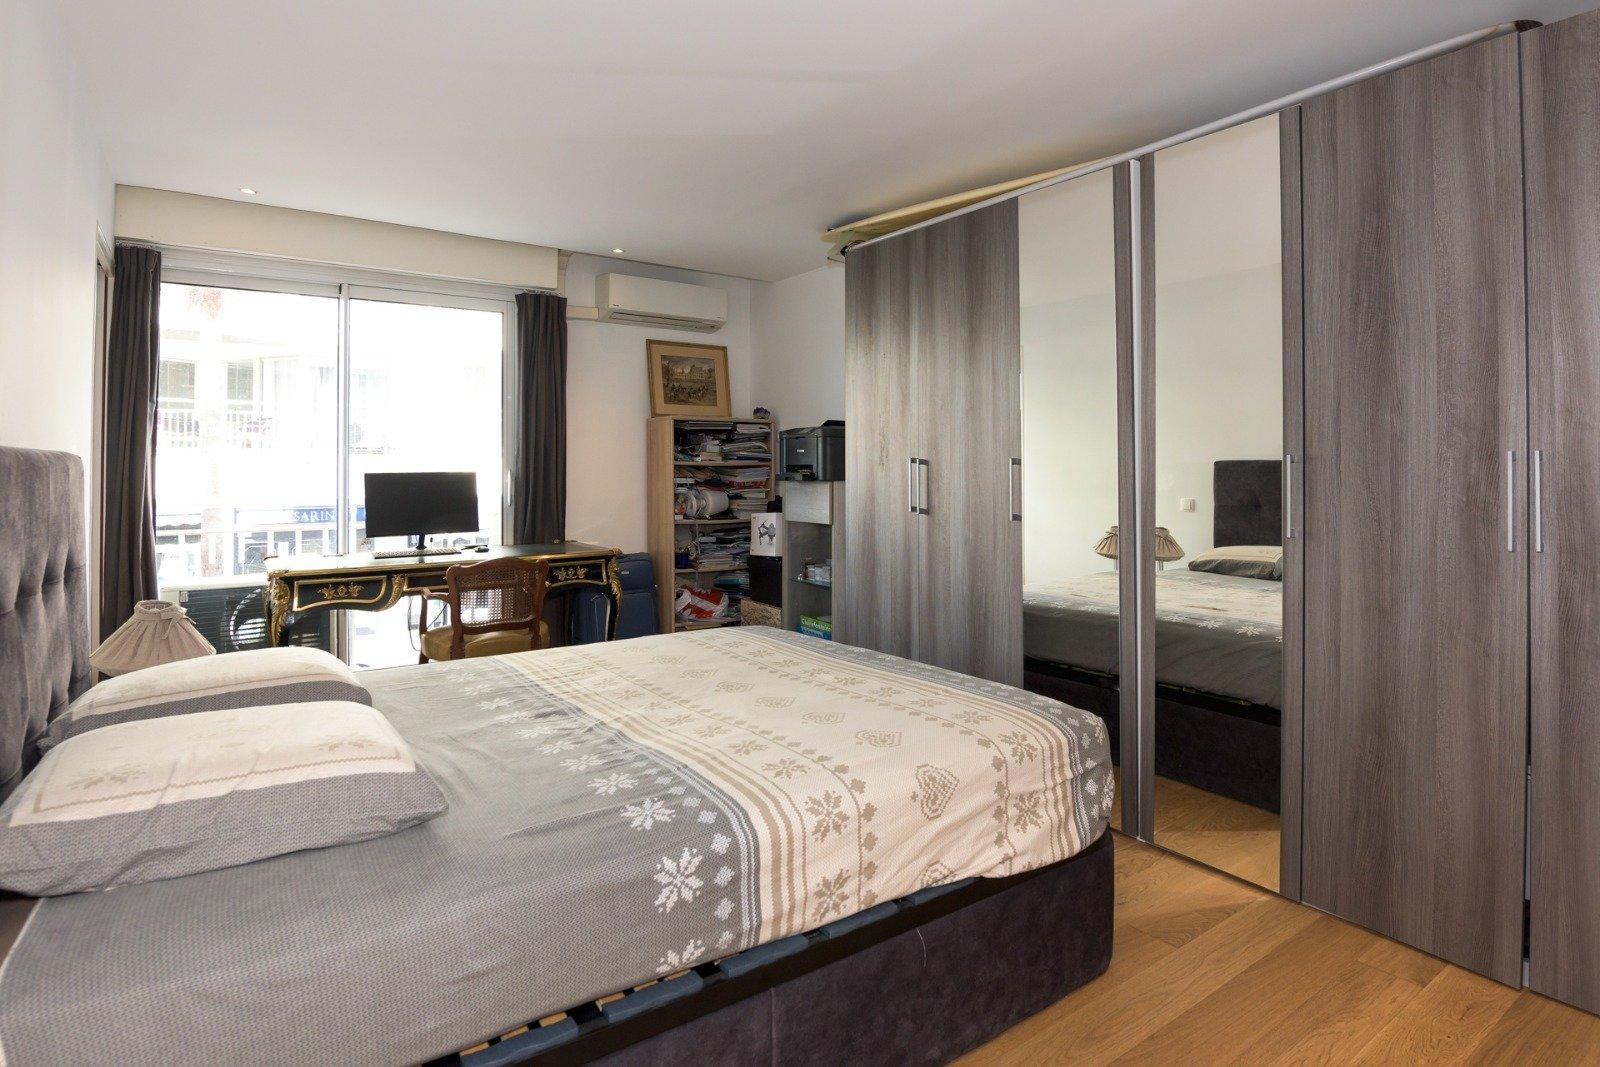 Palm beach,  one bedroom flat renewed